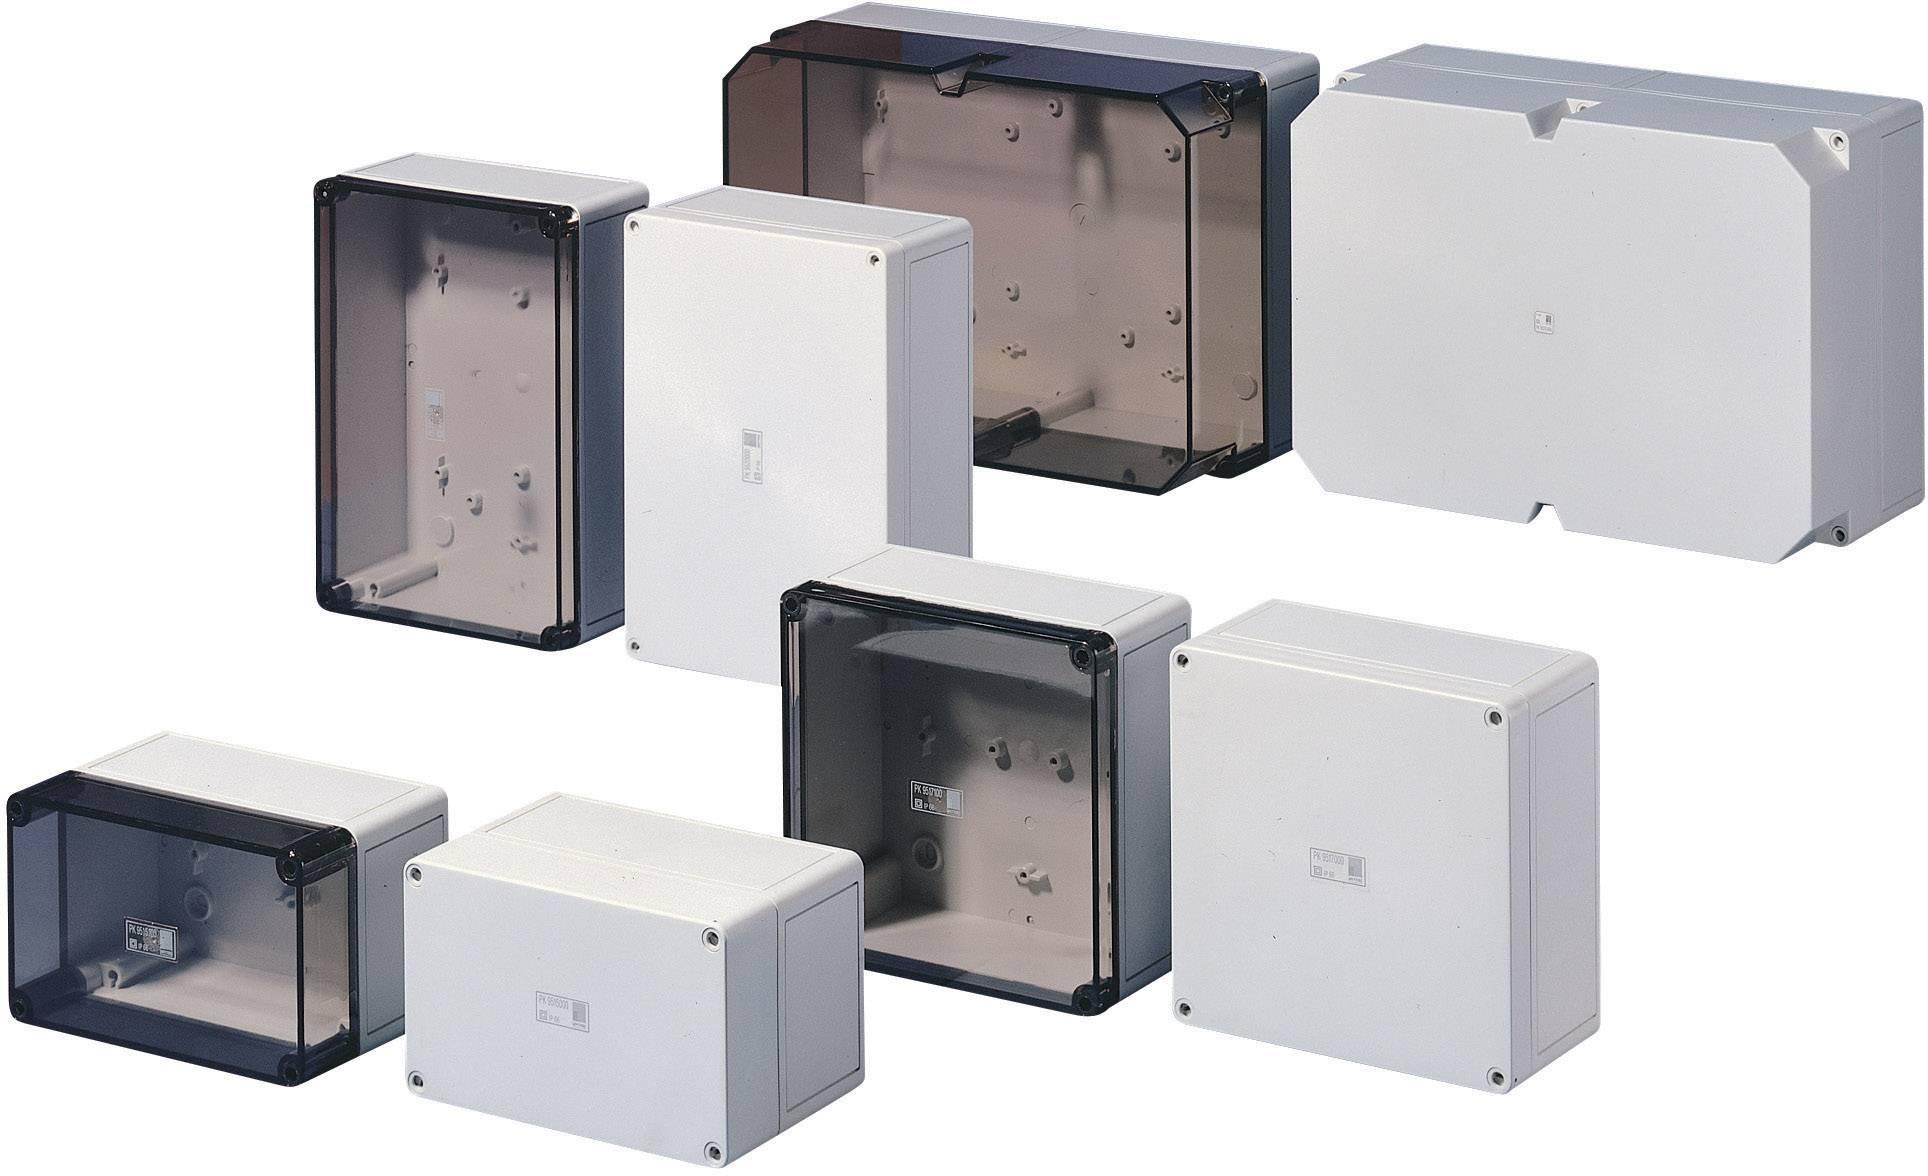 Instalační krabička Rittal PK 9521.000 254 x 180 x 111 polykarbonát světle šedá 1 ks